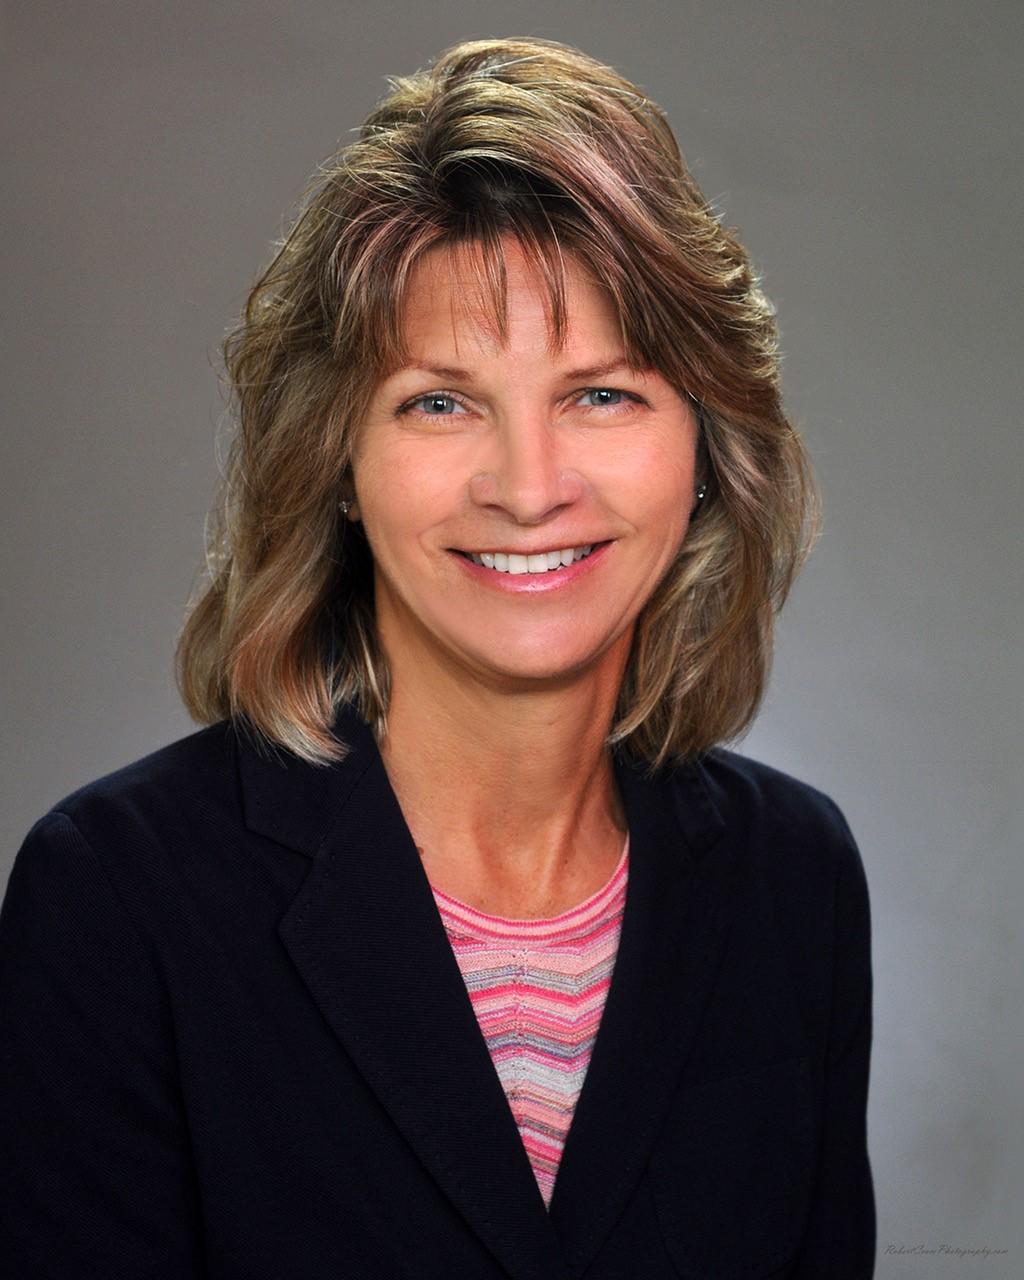 Melisa Reiter, PWS - Principal Environmental Scientist